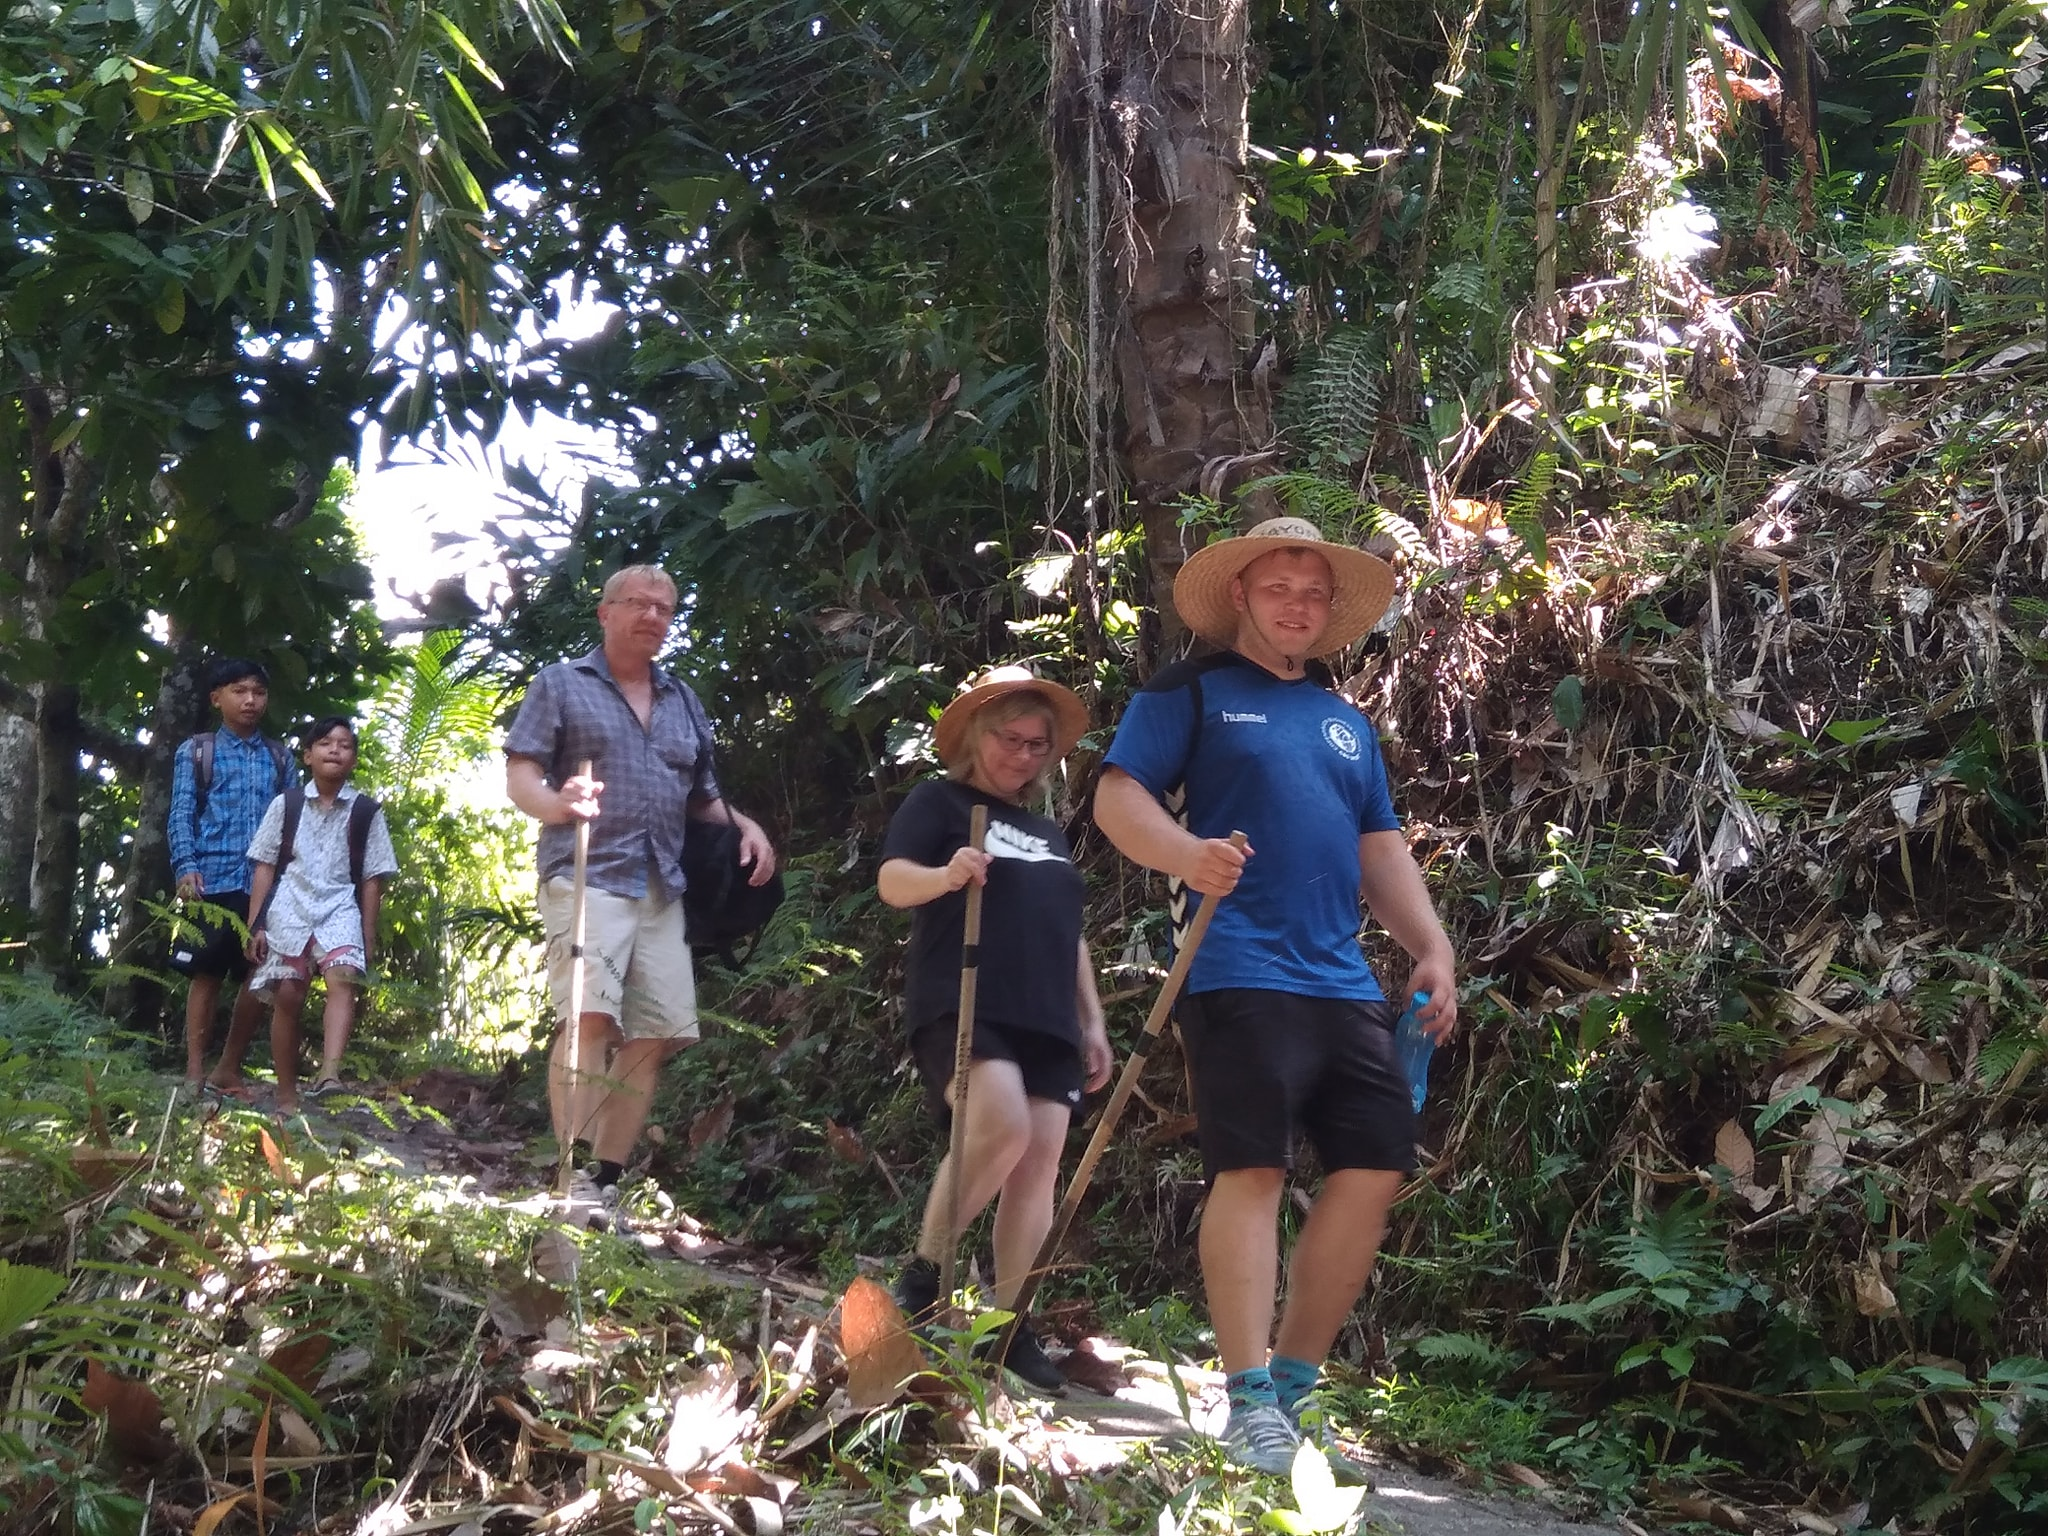 Our guest look really enjoy their trek in MayongVillage